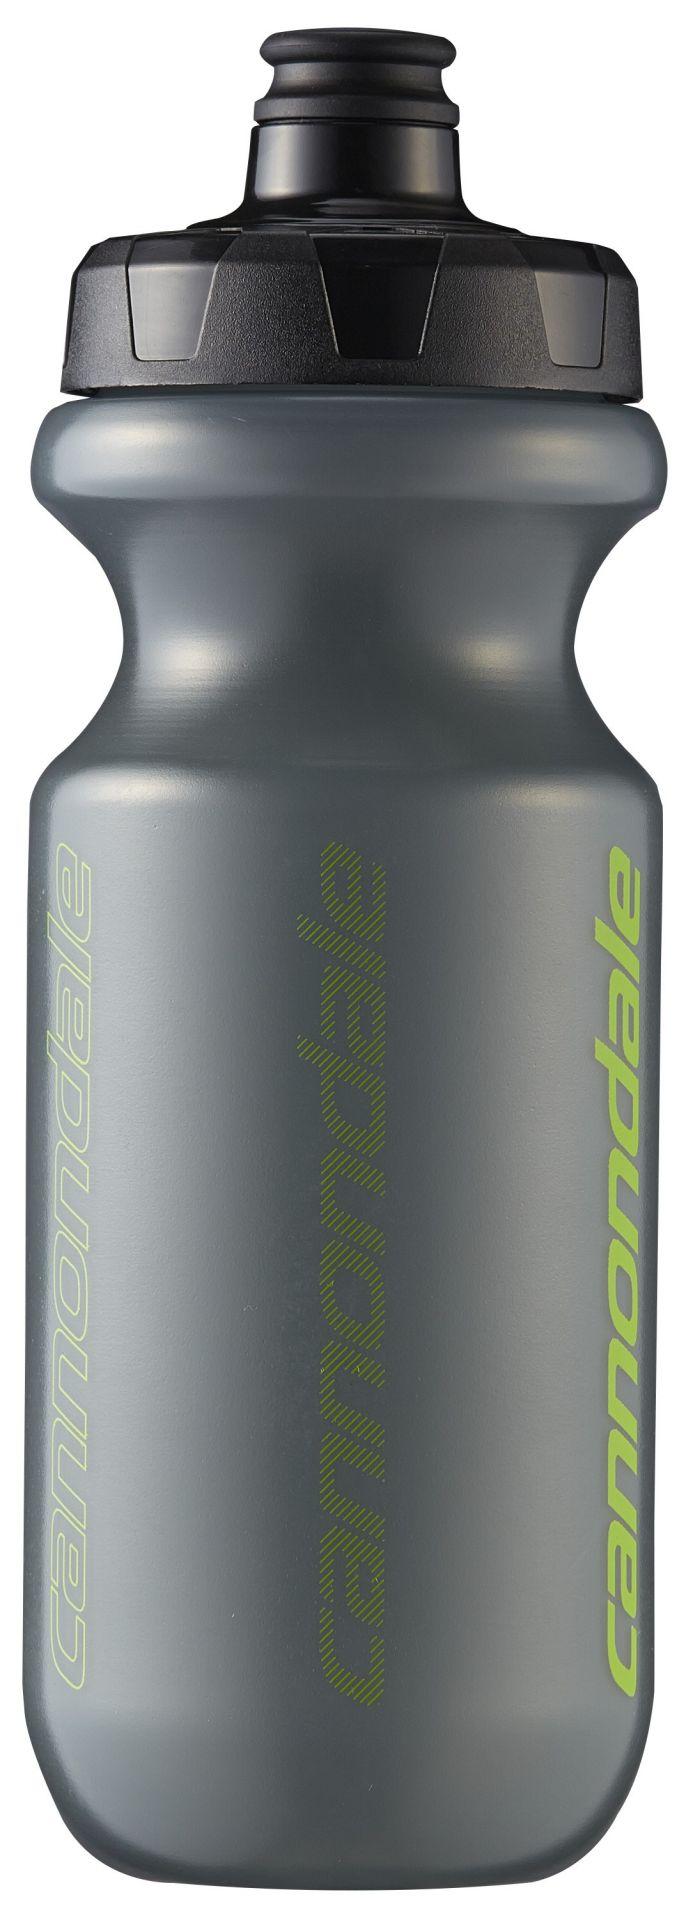 Bidon Cannondale Logo Fade Trans 560 ml Gris fumé